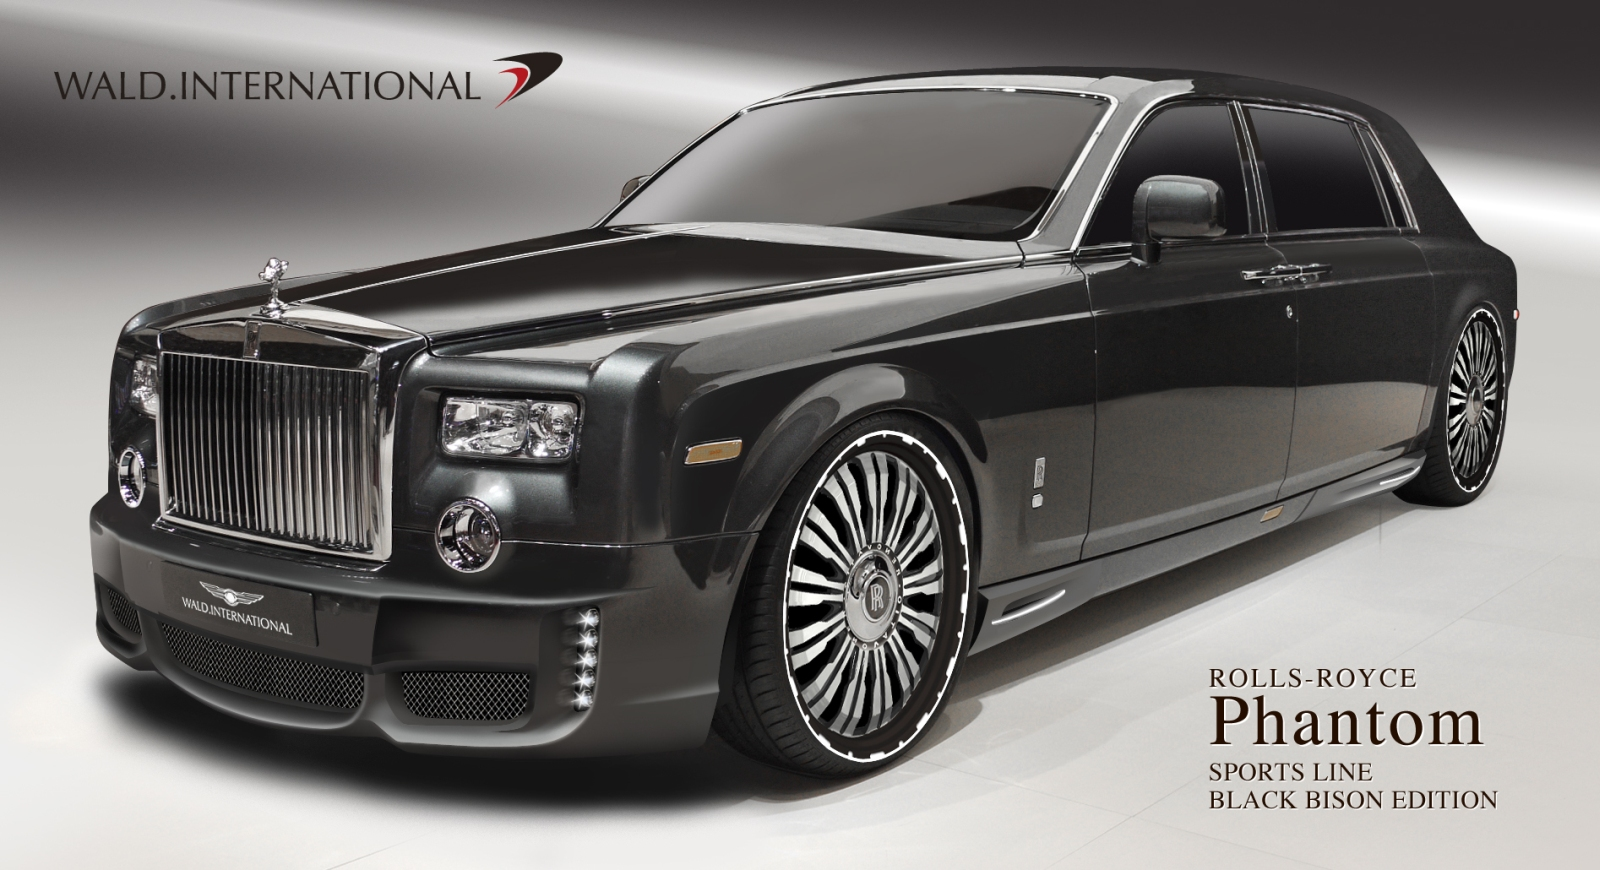 Multimillonario En Hong Kong Compra 30 Rolls Royce Phantom